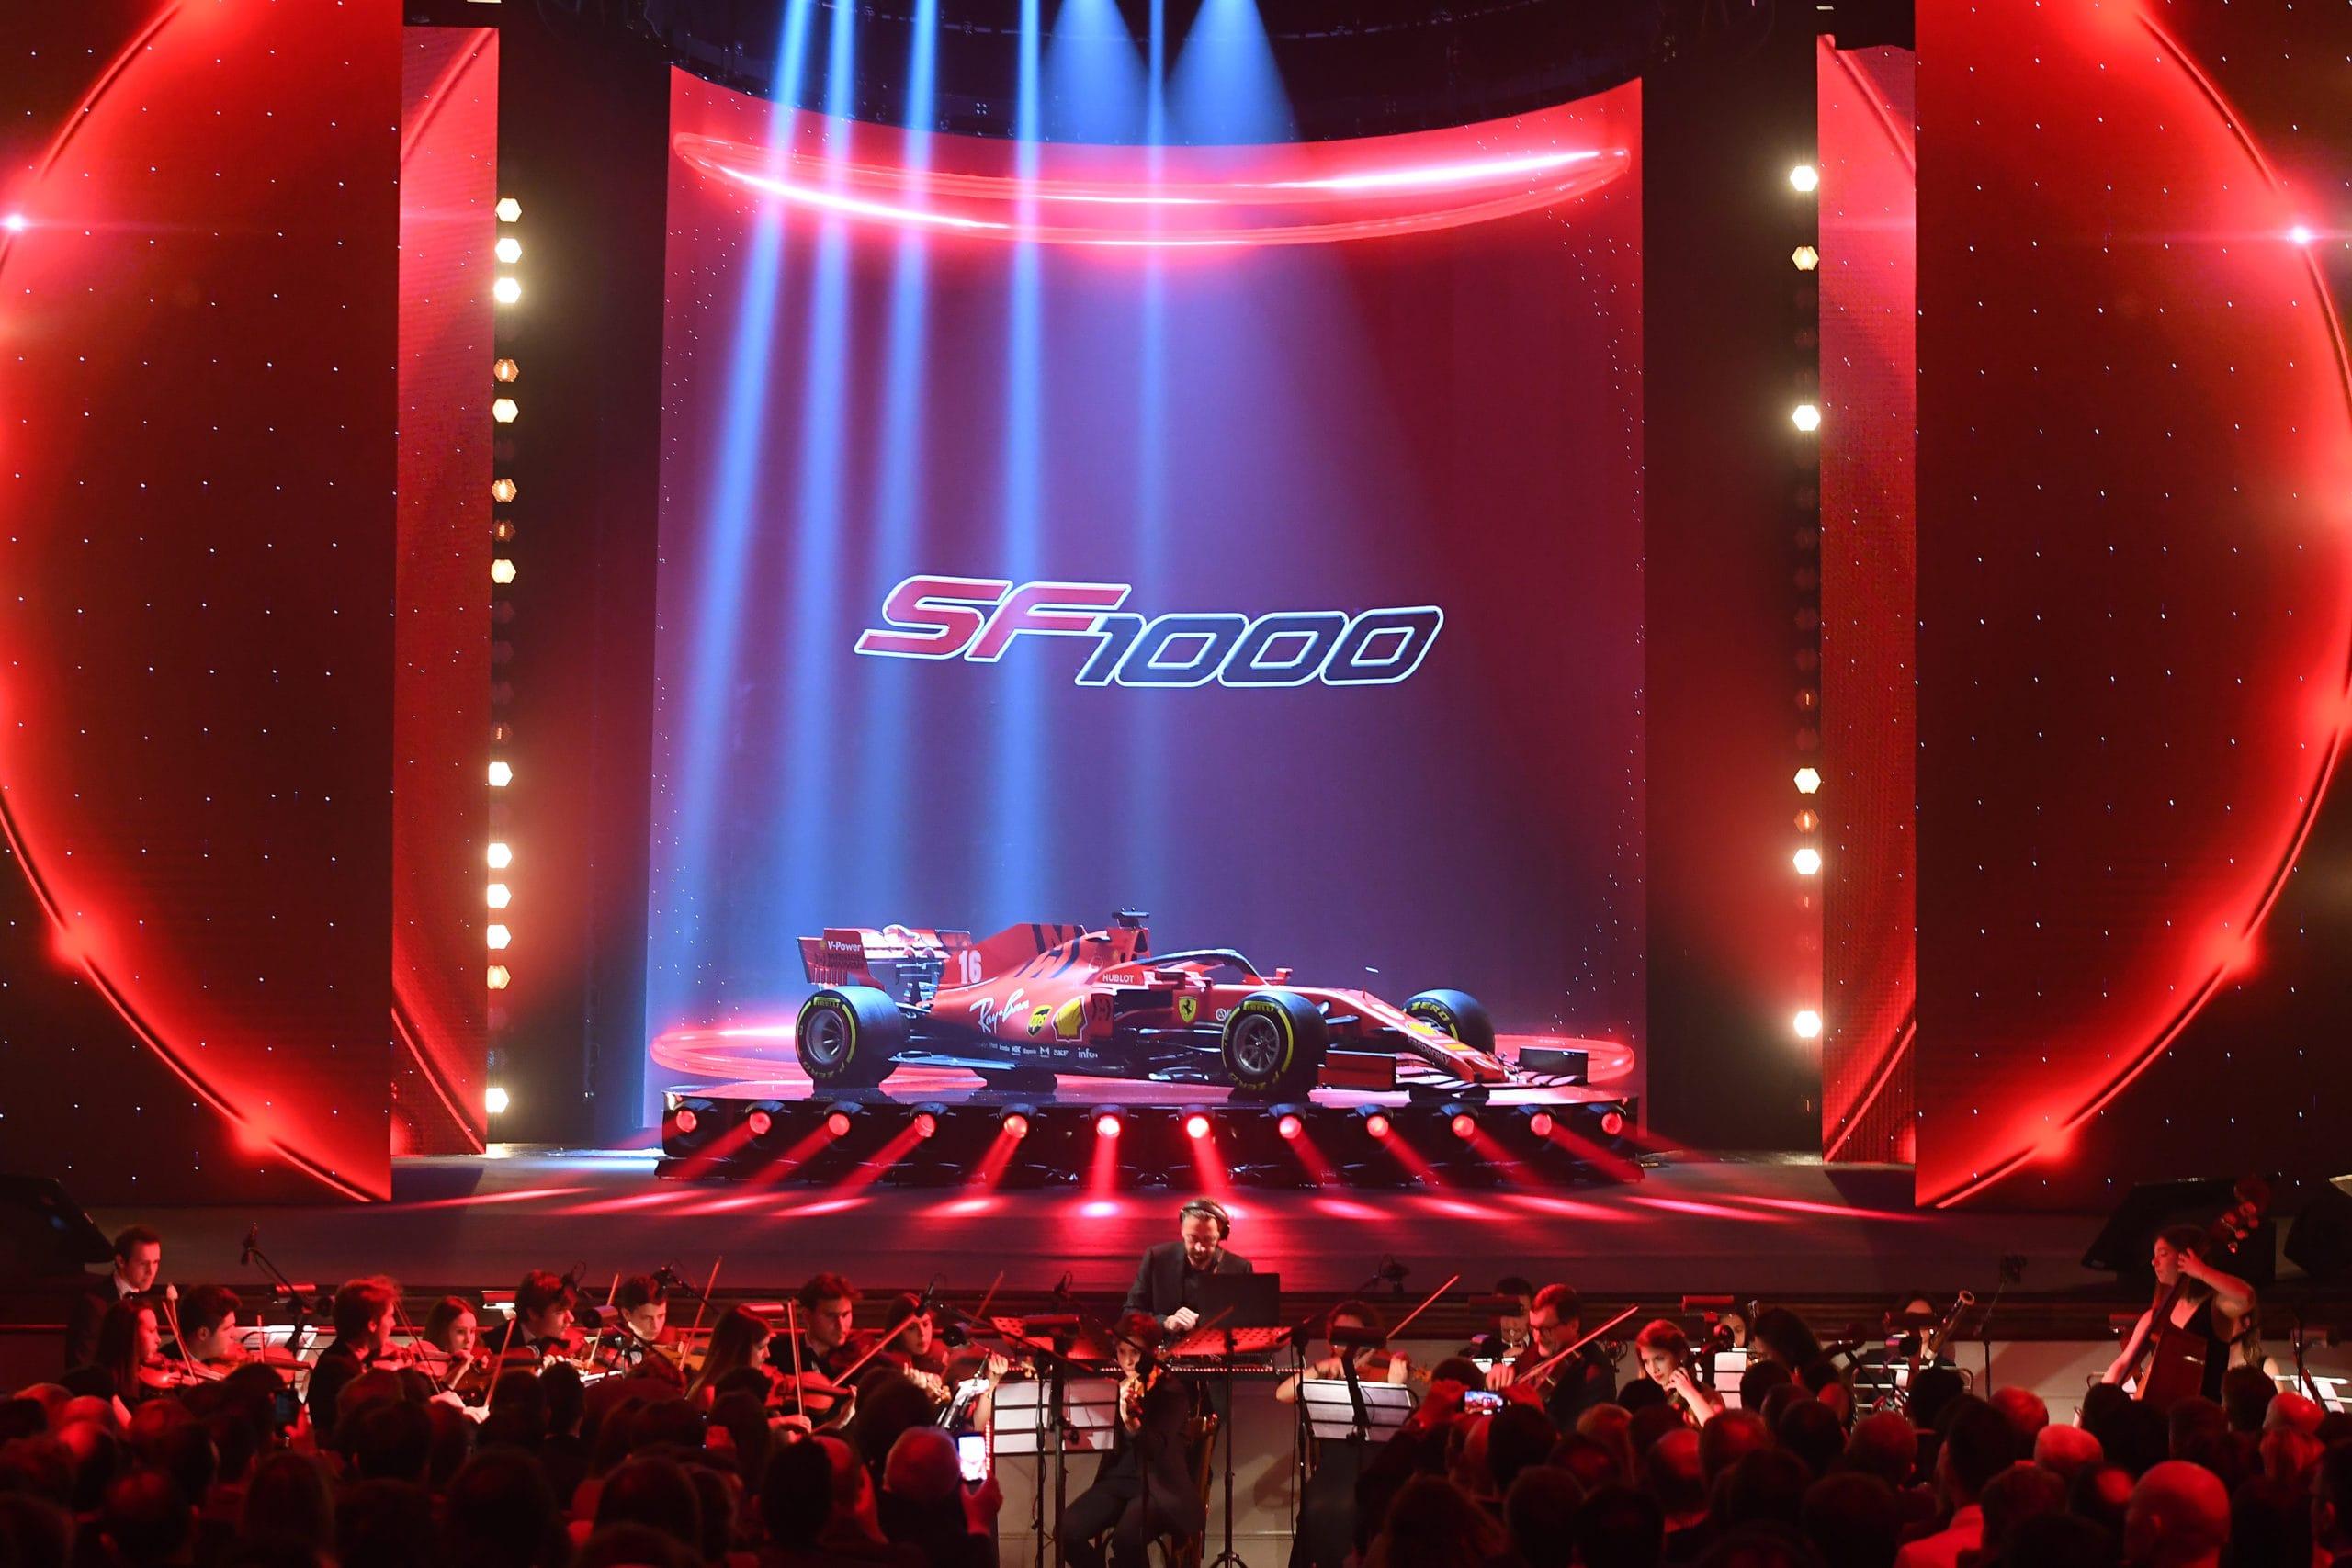 Ferrari say Vettel is ahead of Hamilton for 2021 seat